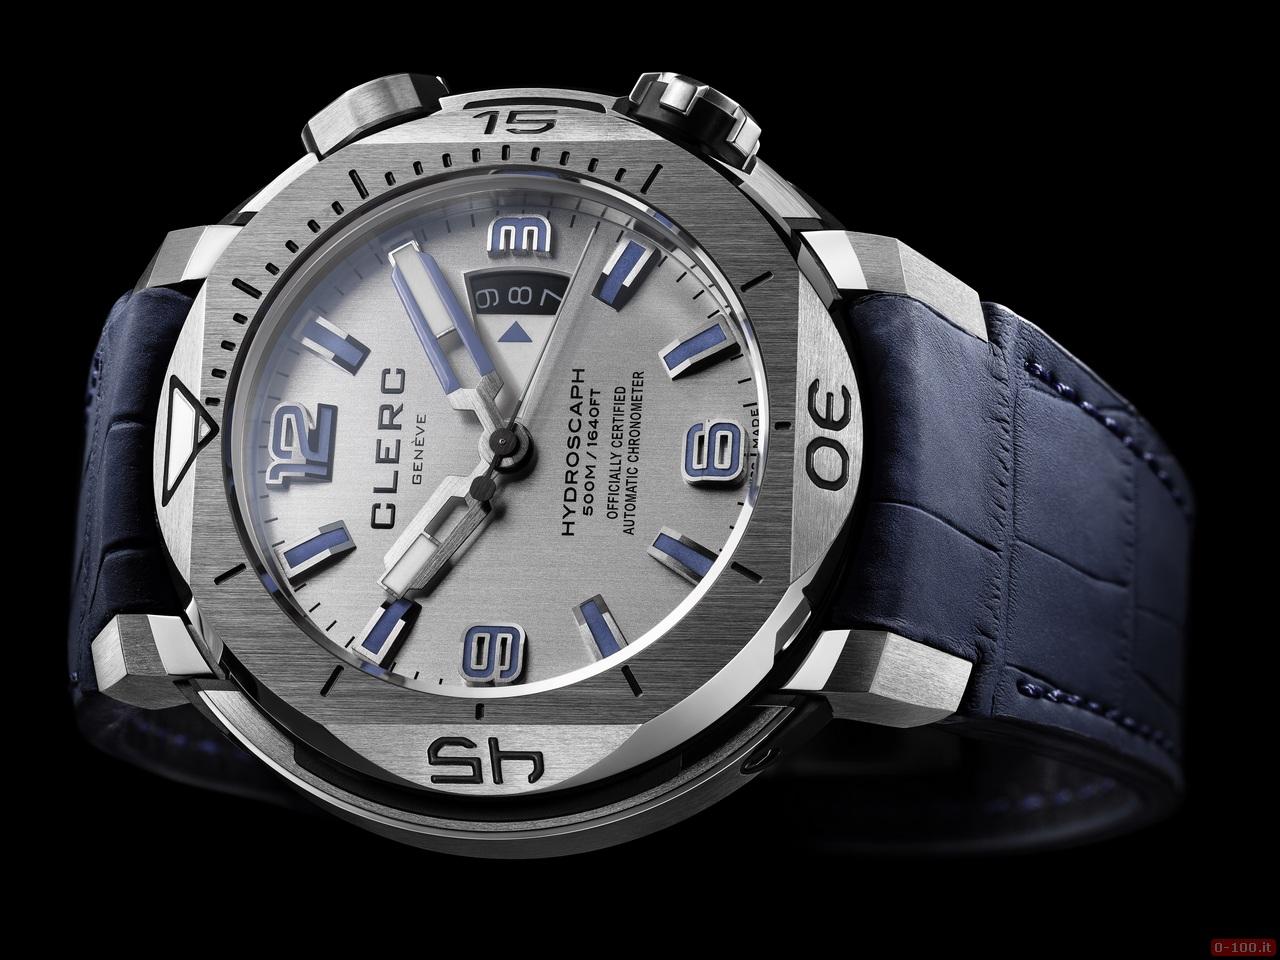 anteprima-baselworld-2014-clerc-hydroscaph-h1-chronometer_0-1003